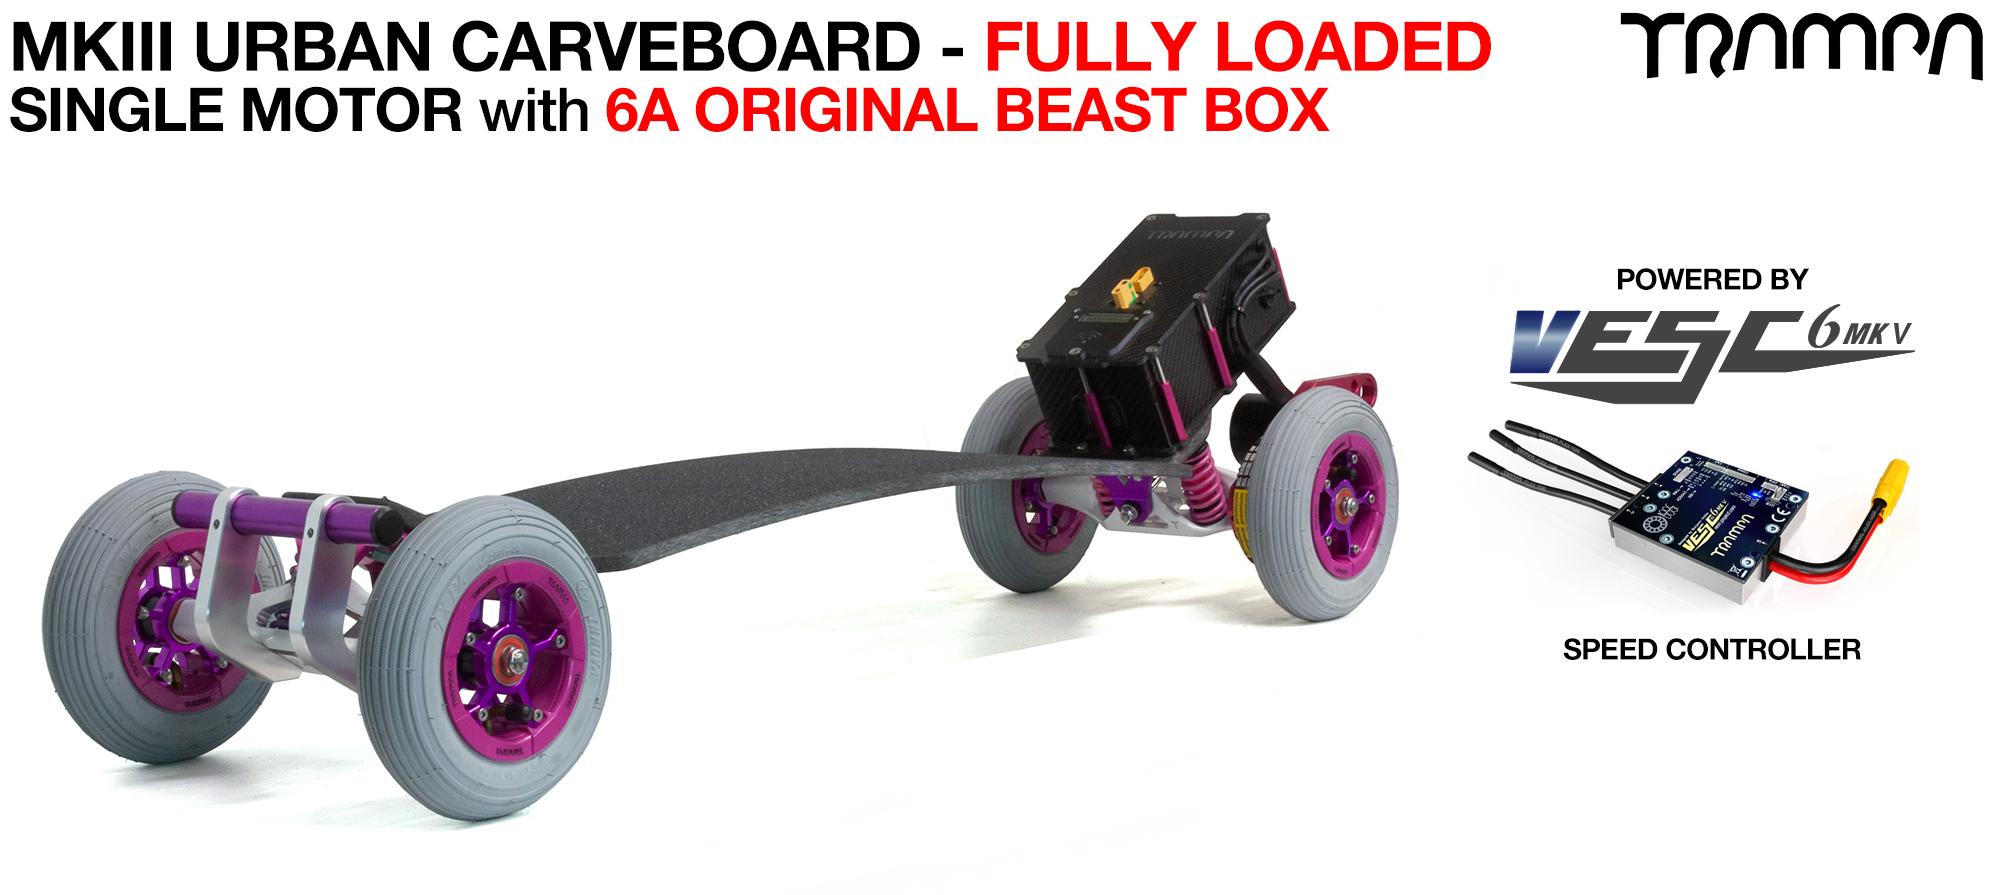 TRAMPA's MkIII Electric URBAN Carveboard - uses Mini Spring Trucks with MkIII Carve board Motor Mount,s Custom TRAMPA hubs & 125mm URBAN longboard Tyres - SINGLE Motor 6.2A FULLY LOADED